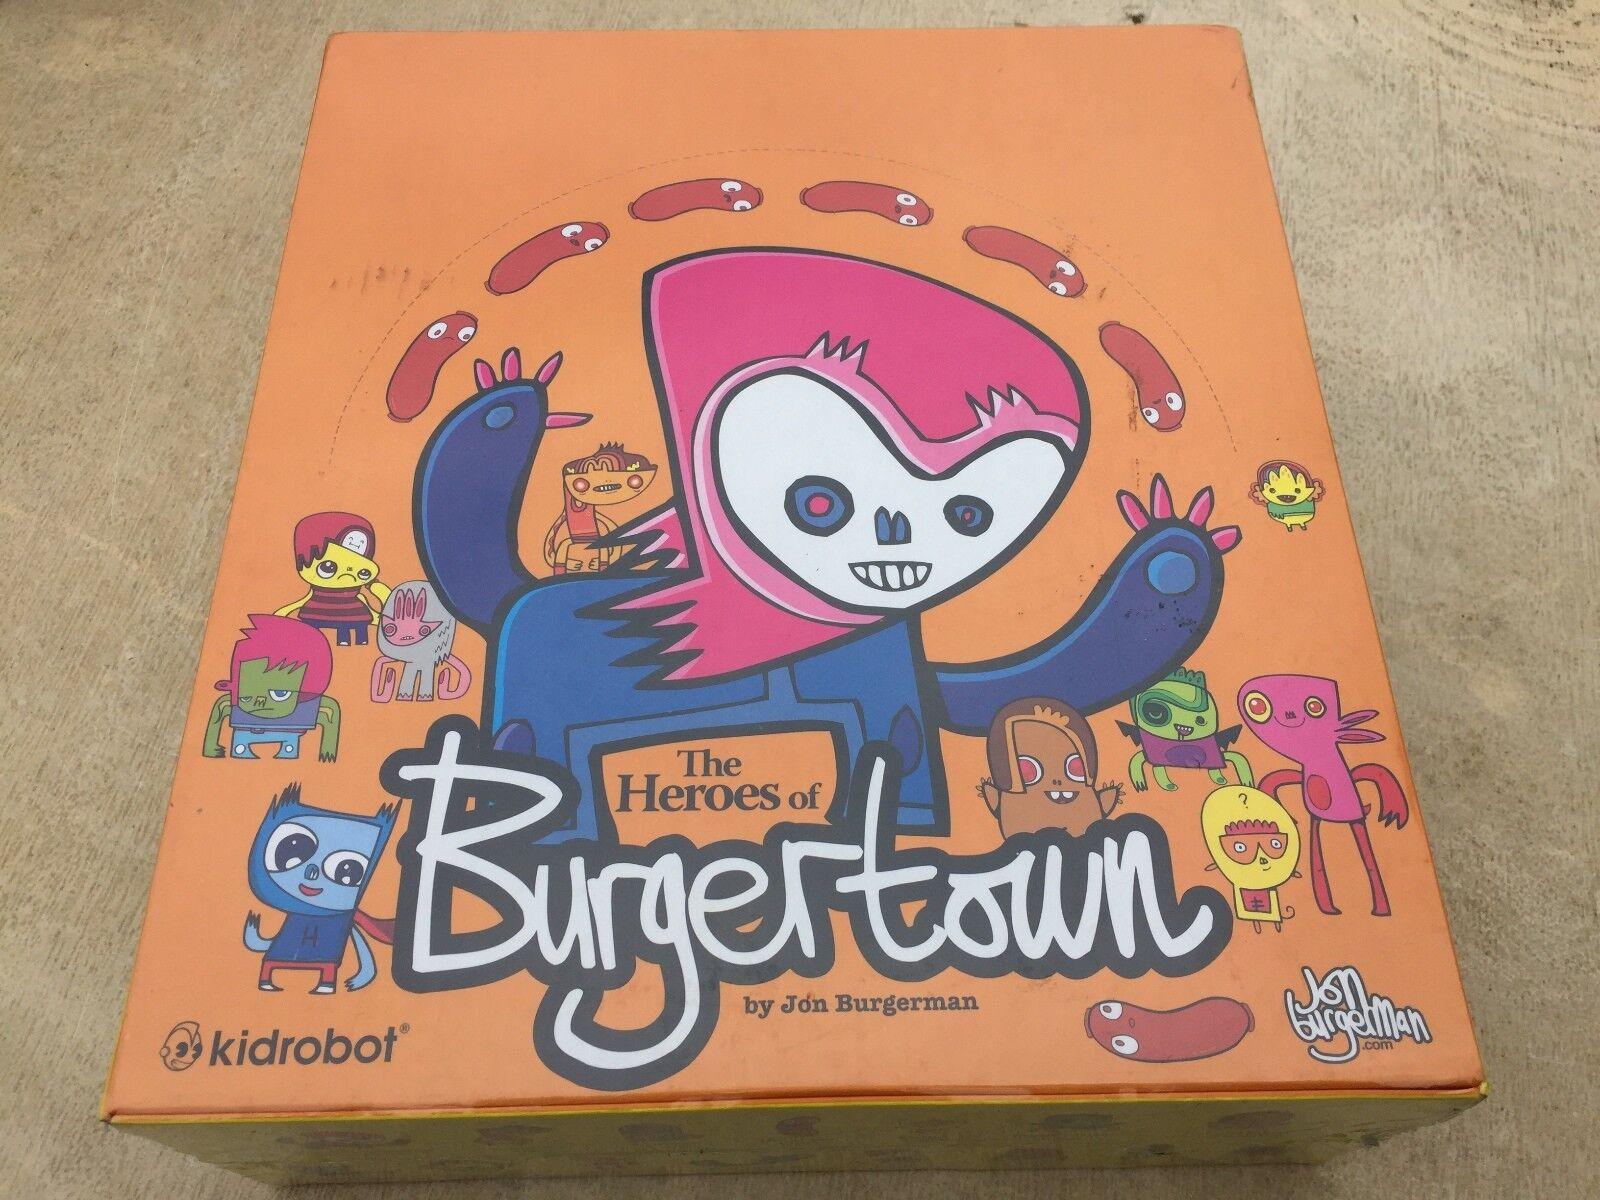 Kidrobot  The Heroes Of Burgertown  Mini Figures 2008, John Burgerman - FULL BOX